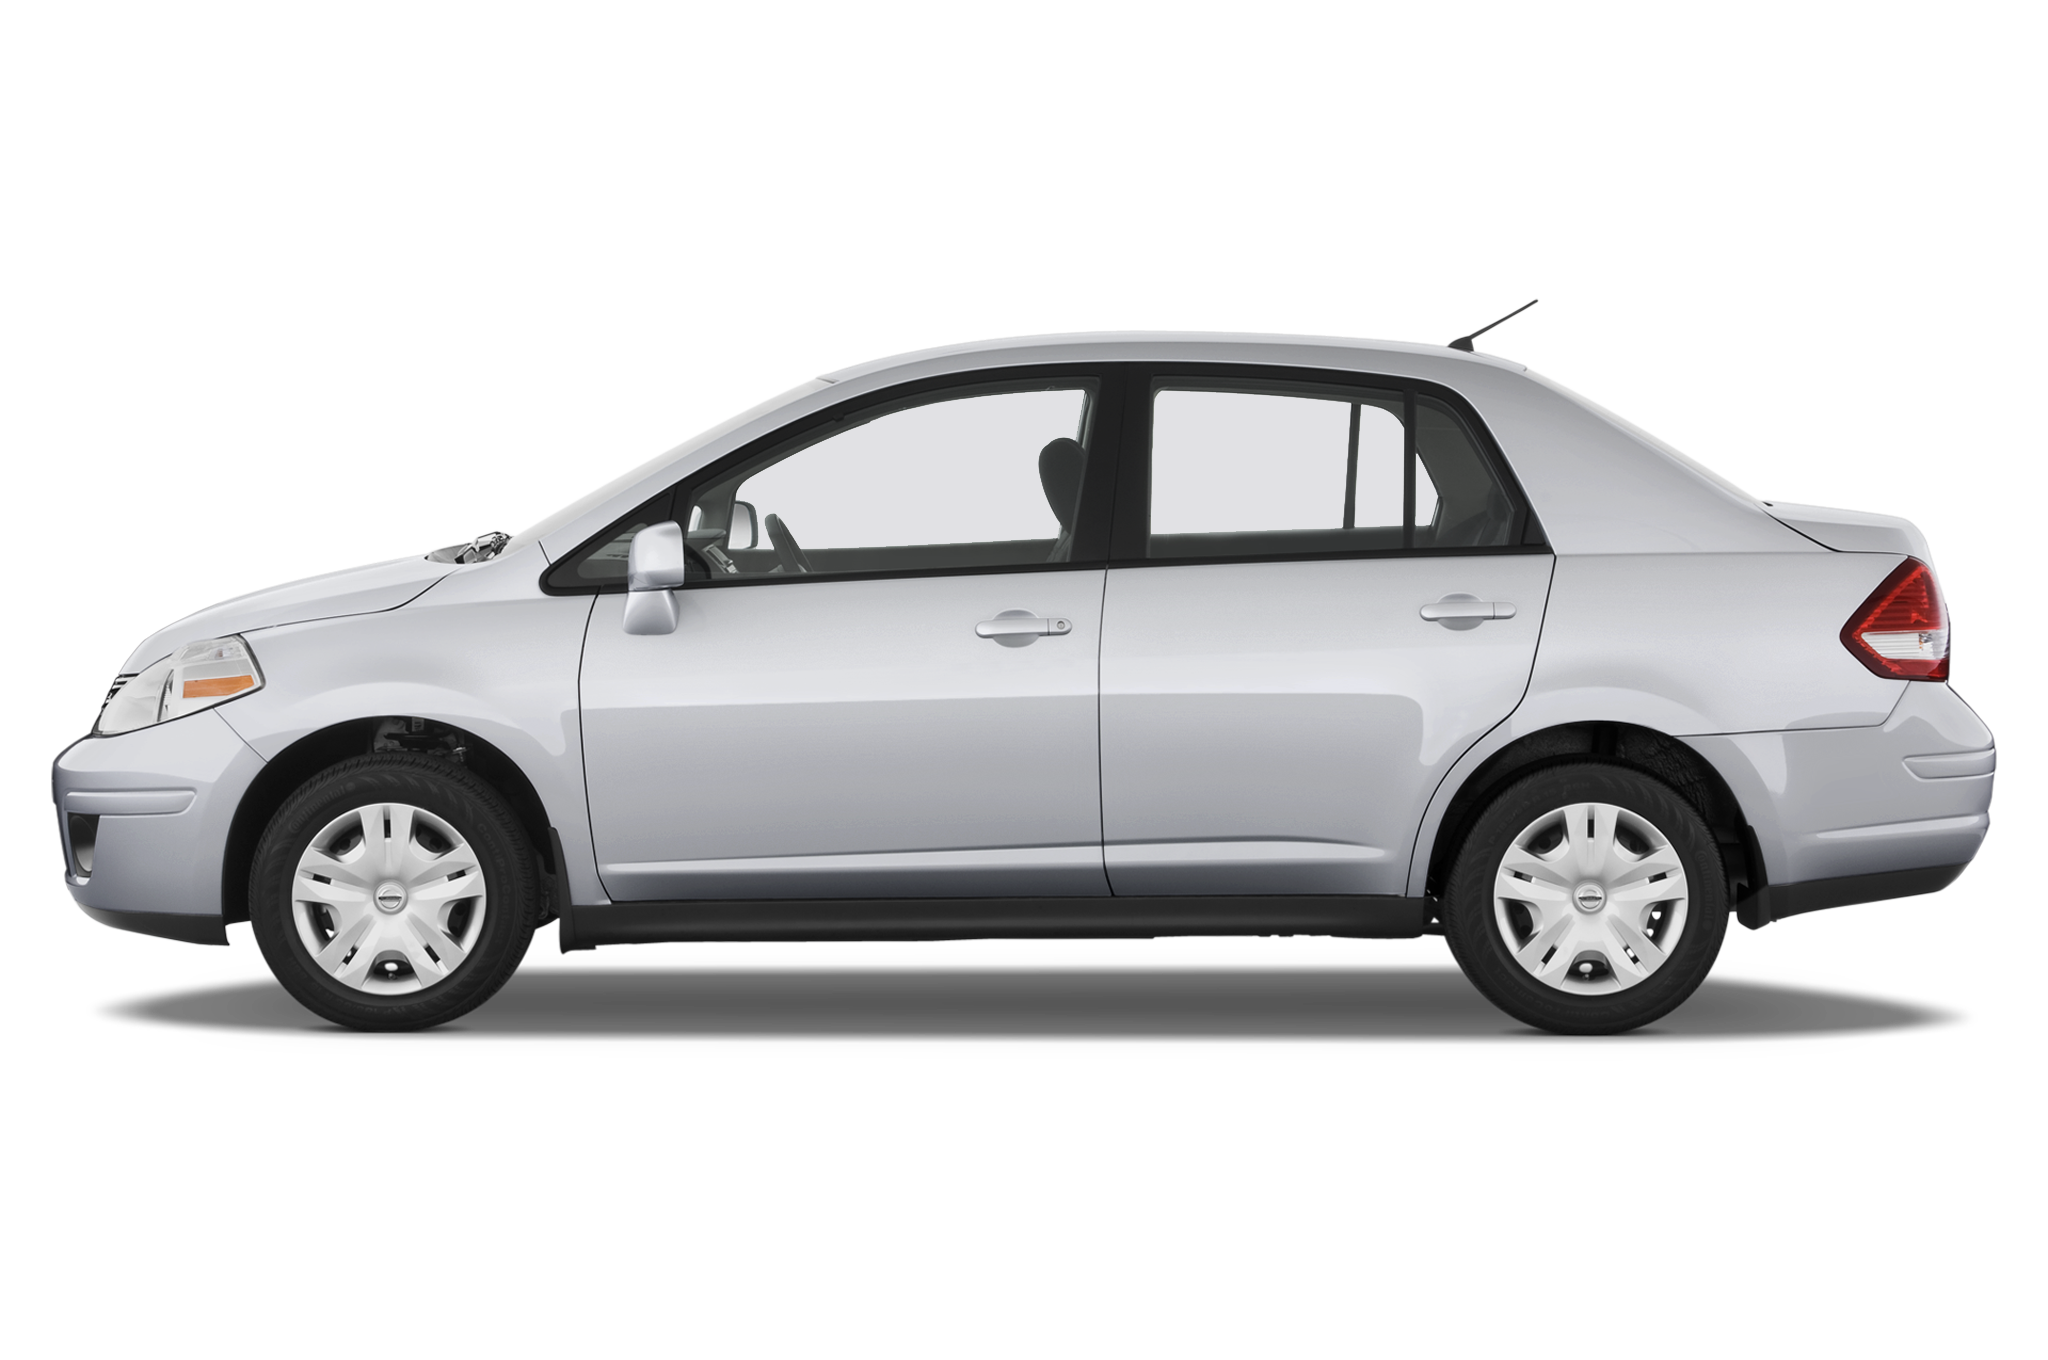 100583575 2017 Nissan Sentra Sv Cvt Open Doors also Unregulated Coal Ash Dumps likewise 370z further Tiida further 2018 Nissan Versa. on 2015 nissan versa power